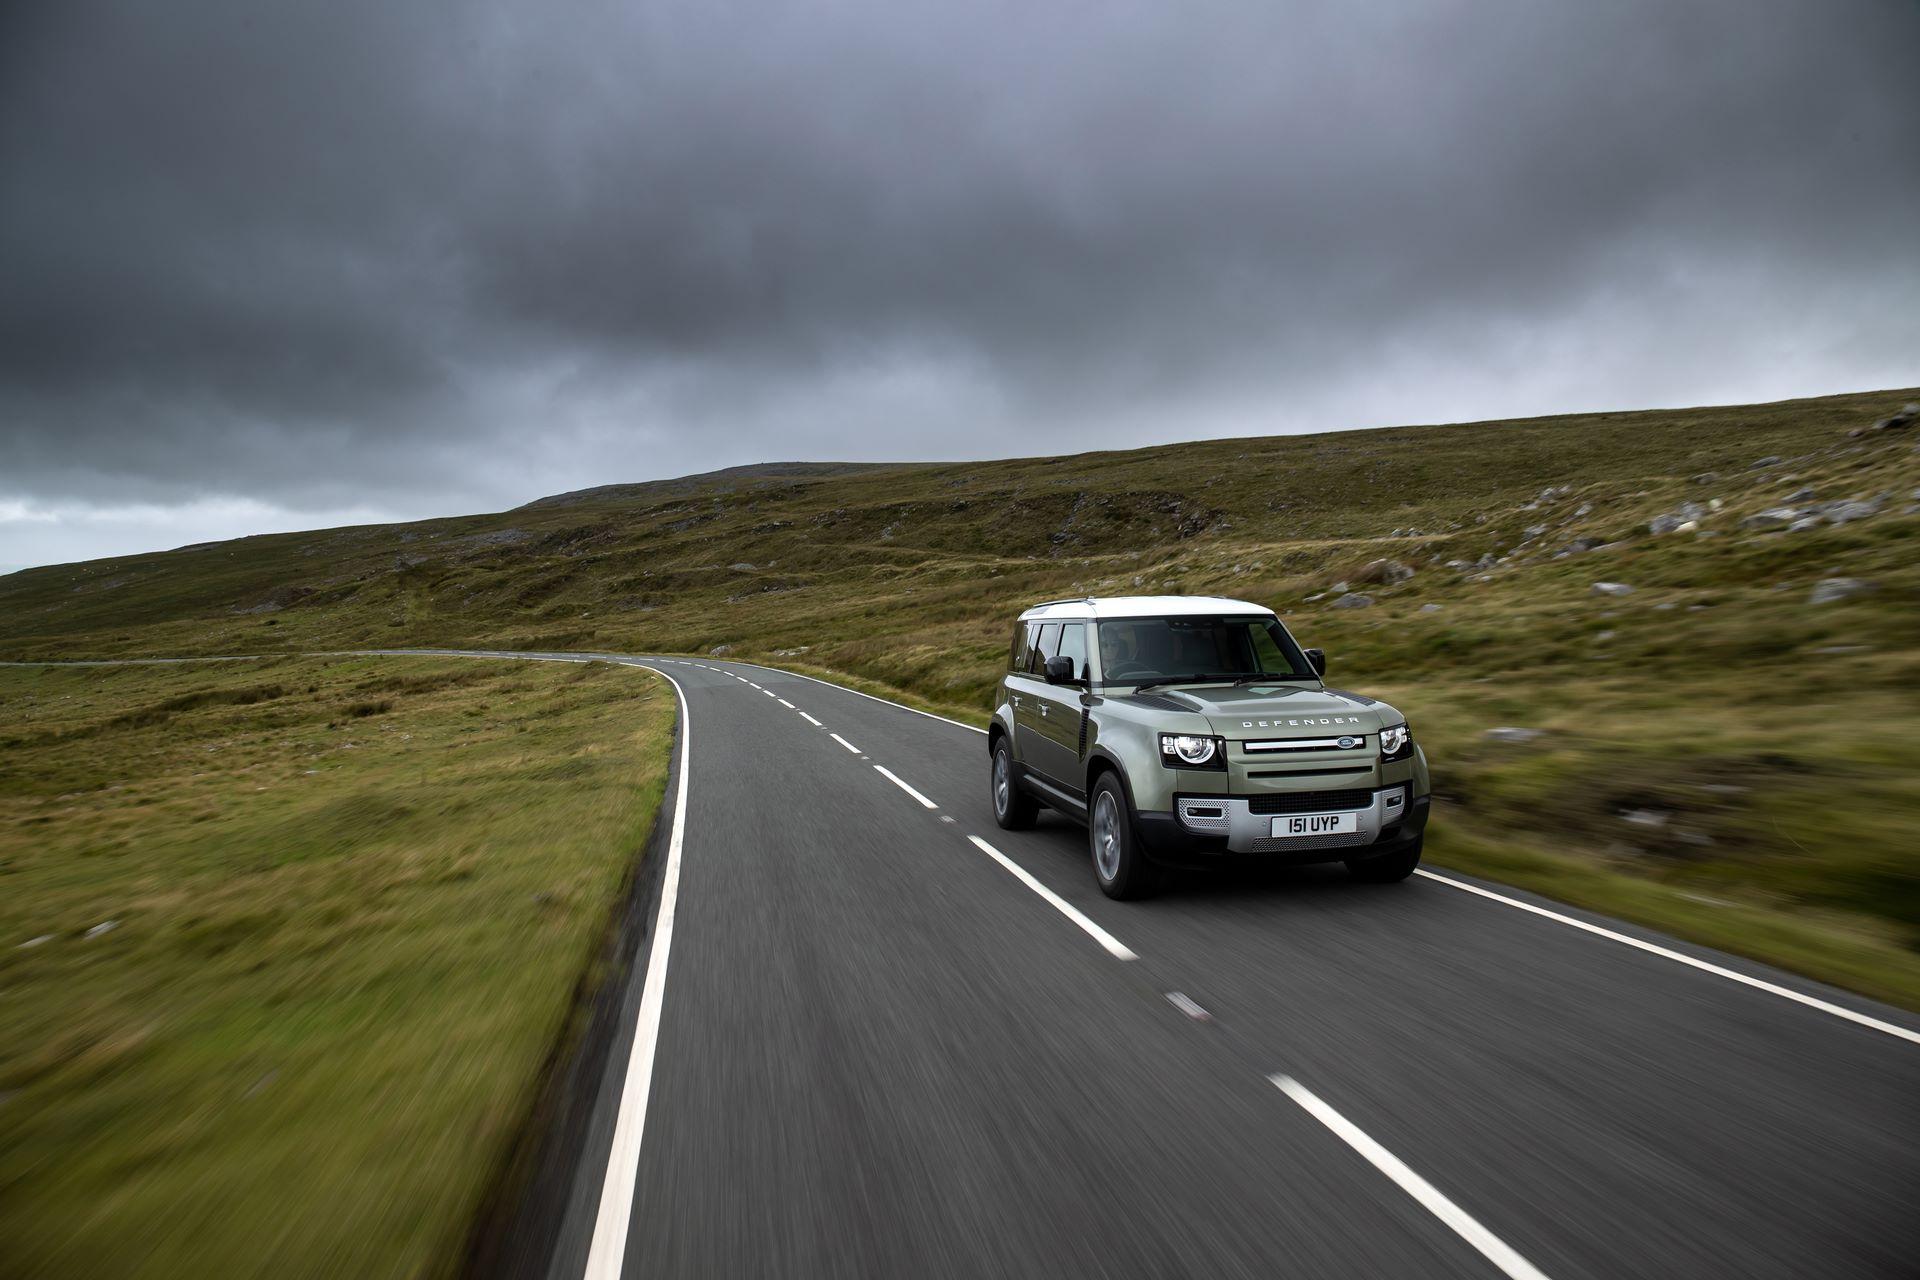 Land-Rover-Defender-Fuel-Cell-Hydrogen-concept-4